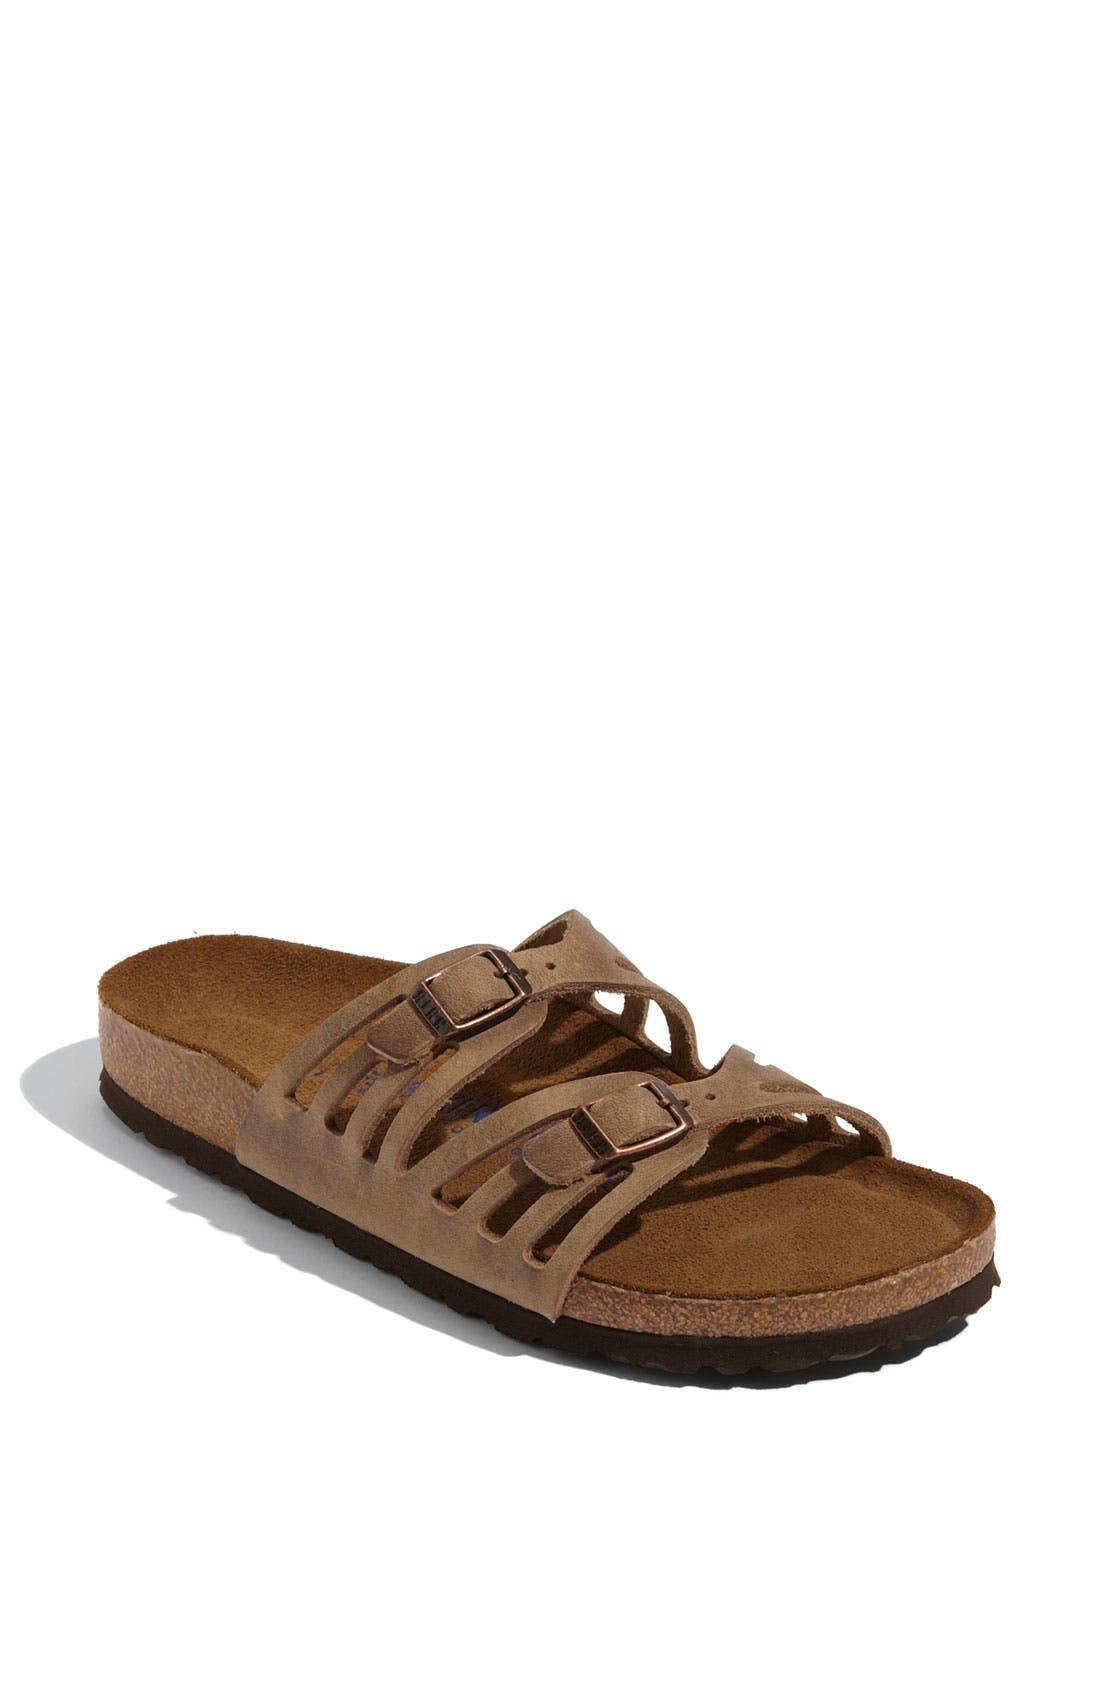 Granada Soft Footbed Oiled Leather Sandal,                         Main,                         color, TOBACCO